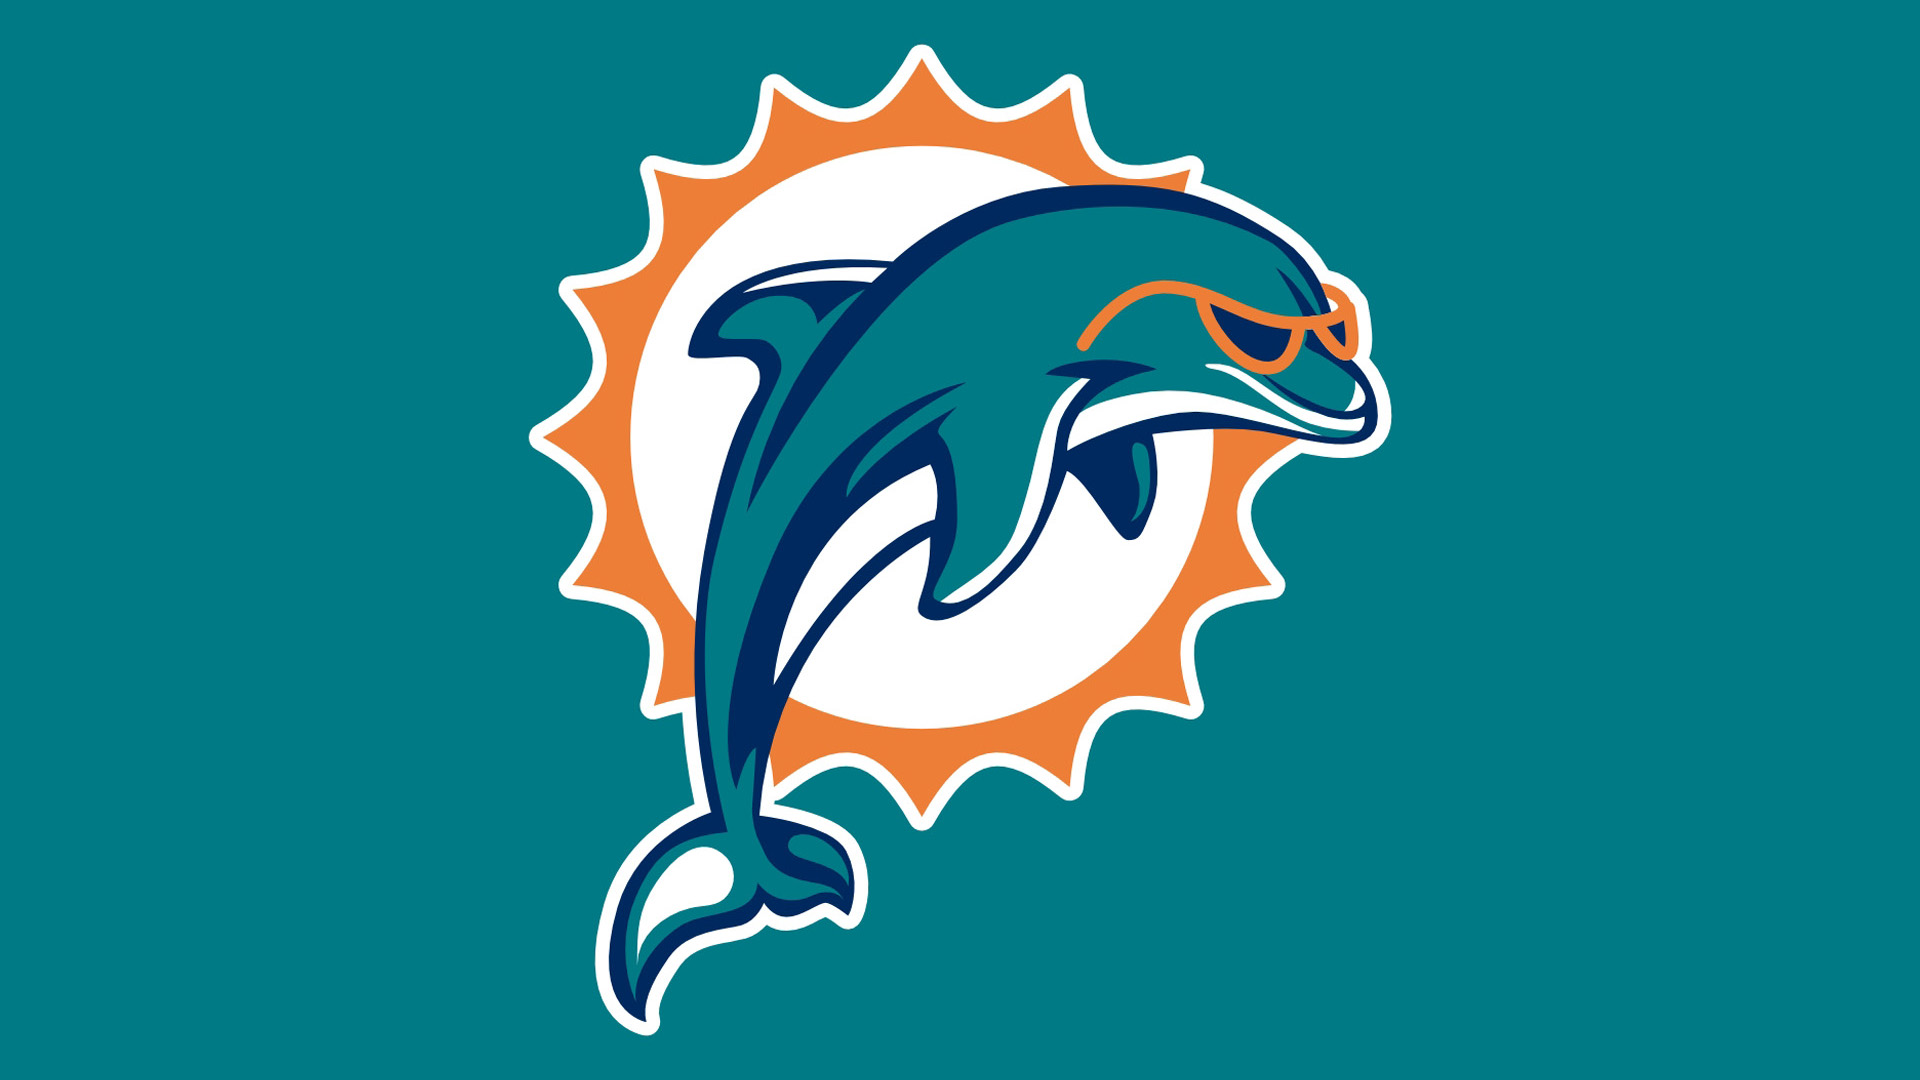 Miami Dolphins desktop background